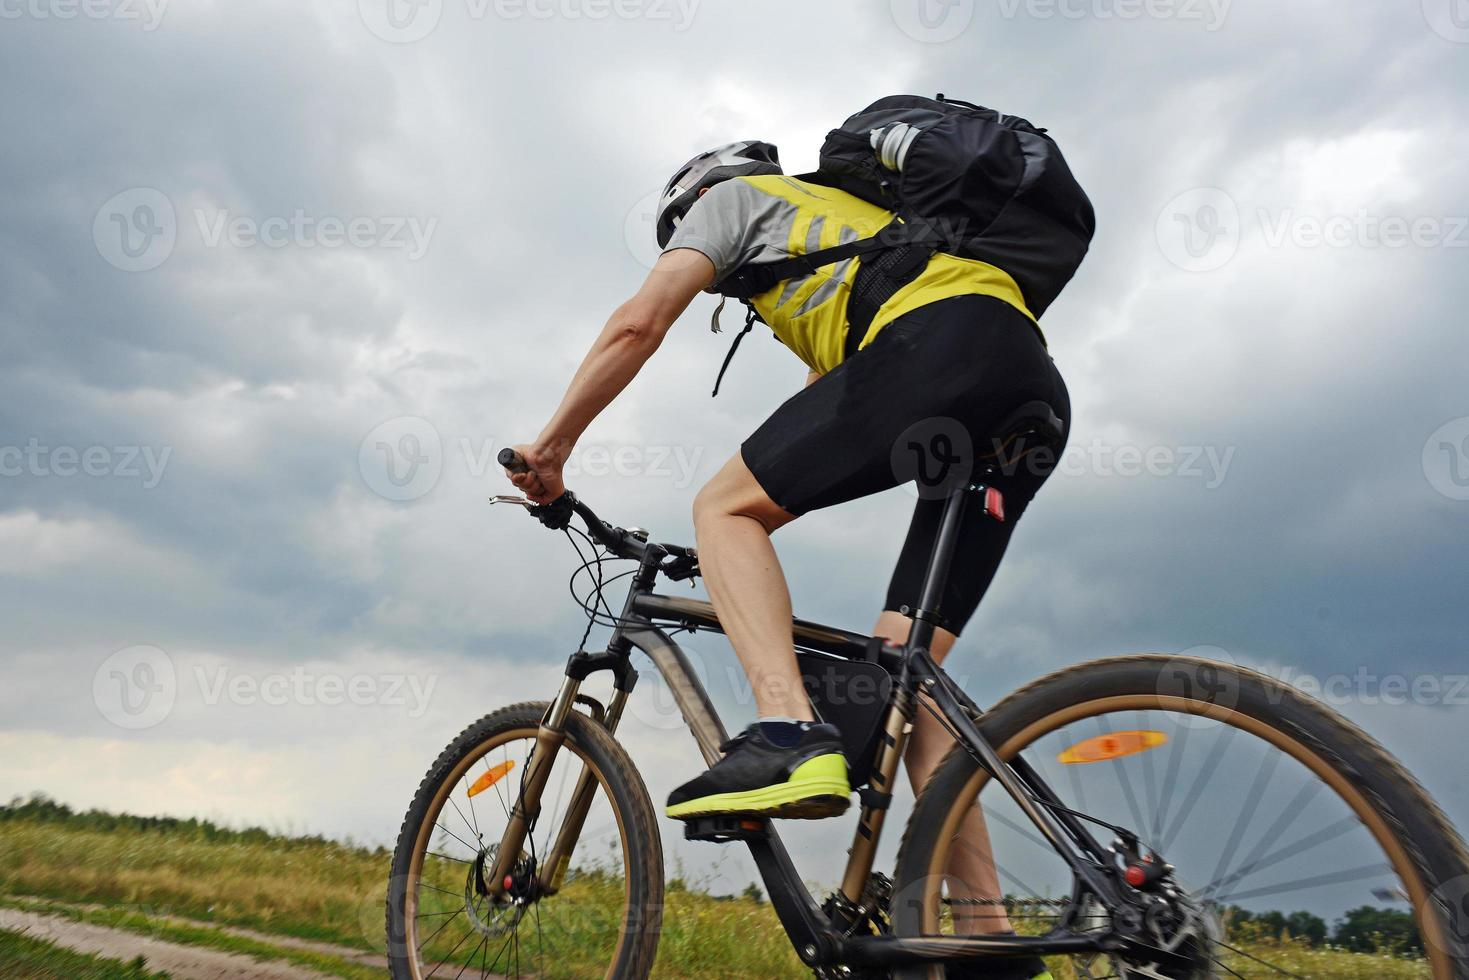 deporte extremo en bicicleta de montaña foto